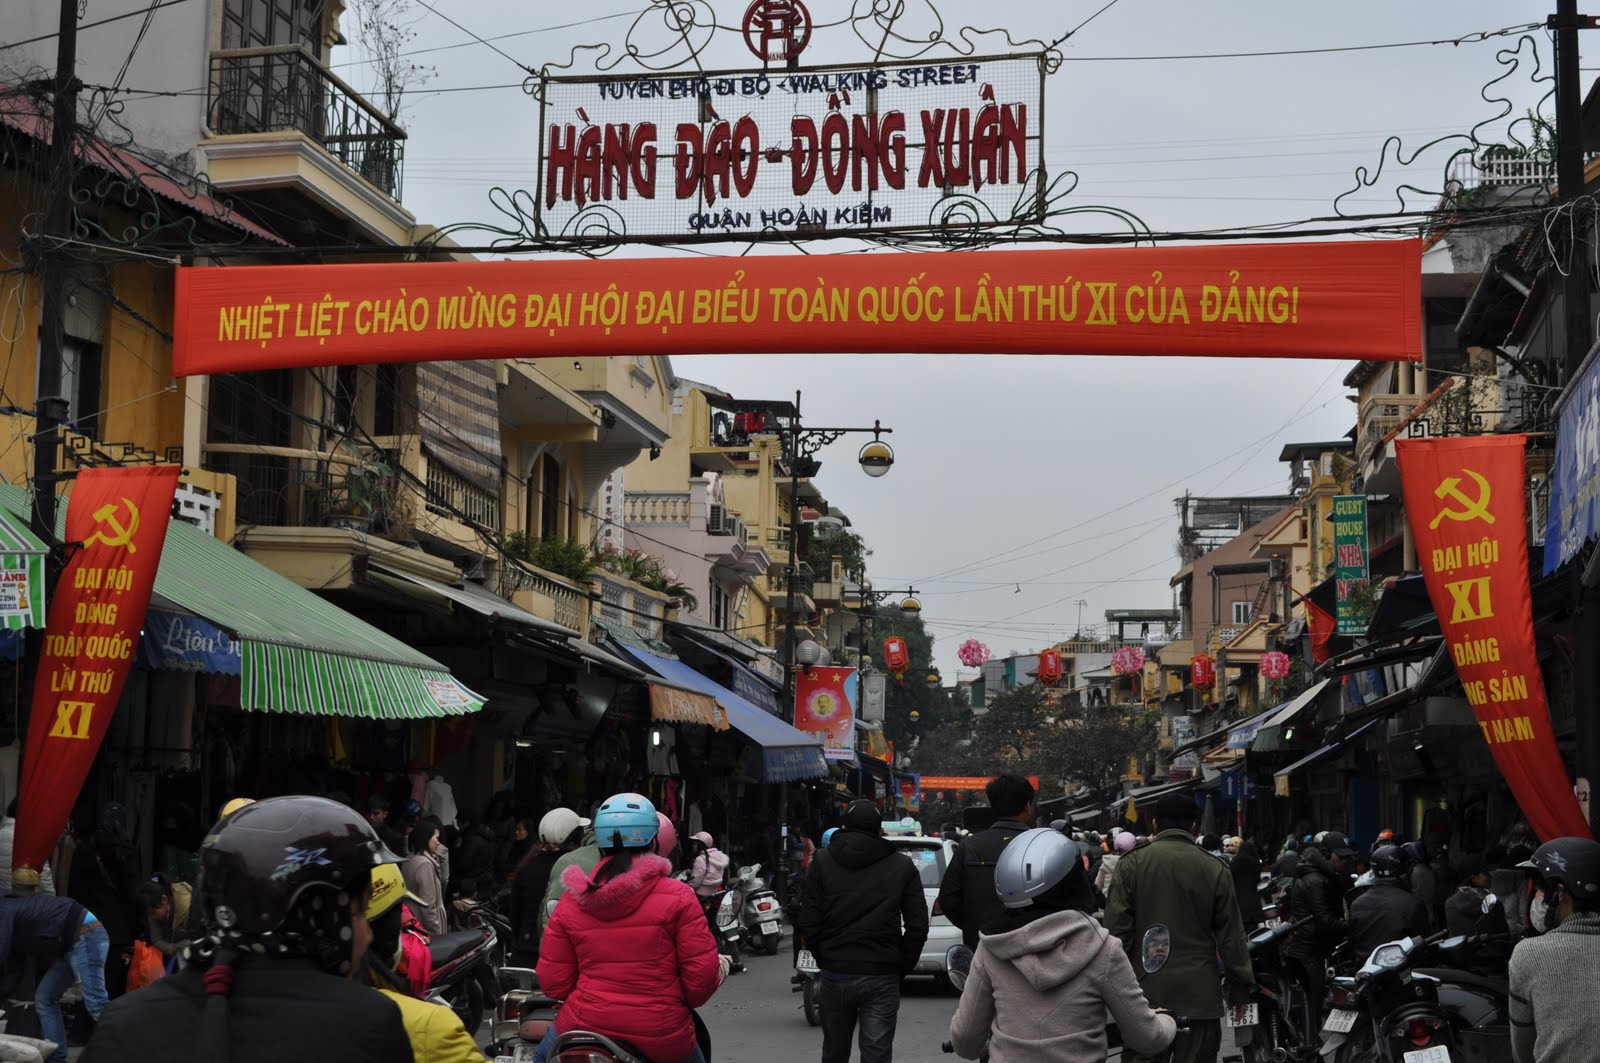 http://2.bp.blogspot.com/_sW3xfs6i-8E/TTwpnwnI7aI/AAAAAAAABFk/uvFB9iW0Or4/s1600/Hanoi%2BStreets%2B23Jan2011%2B025.jpg